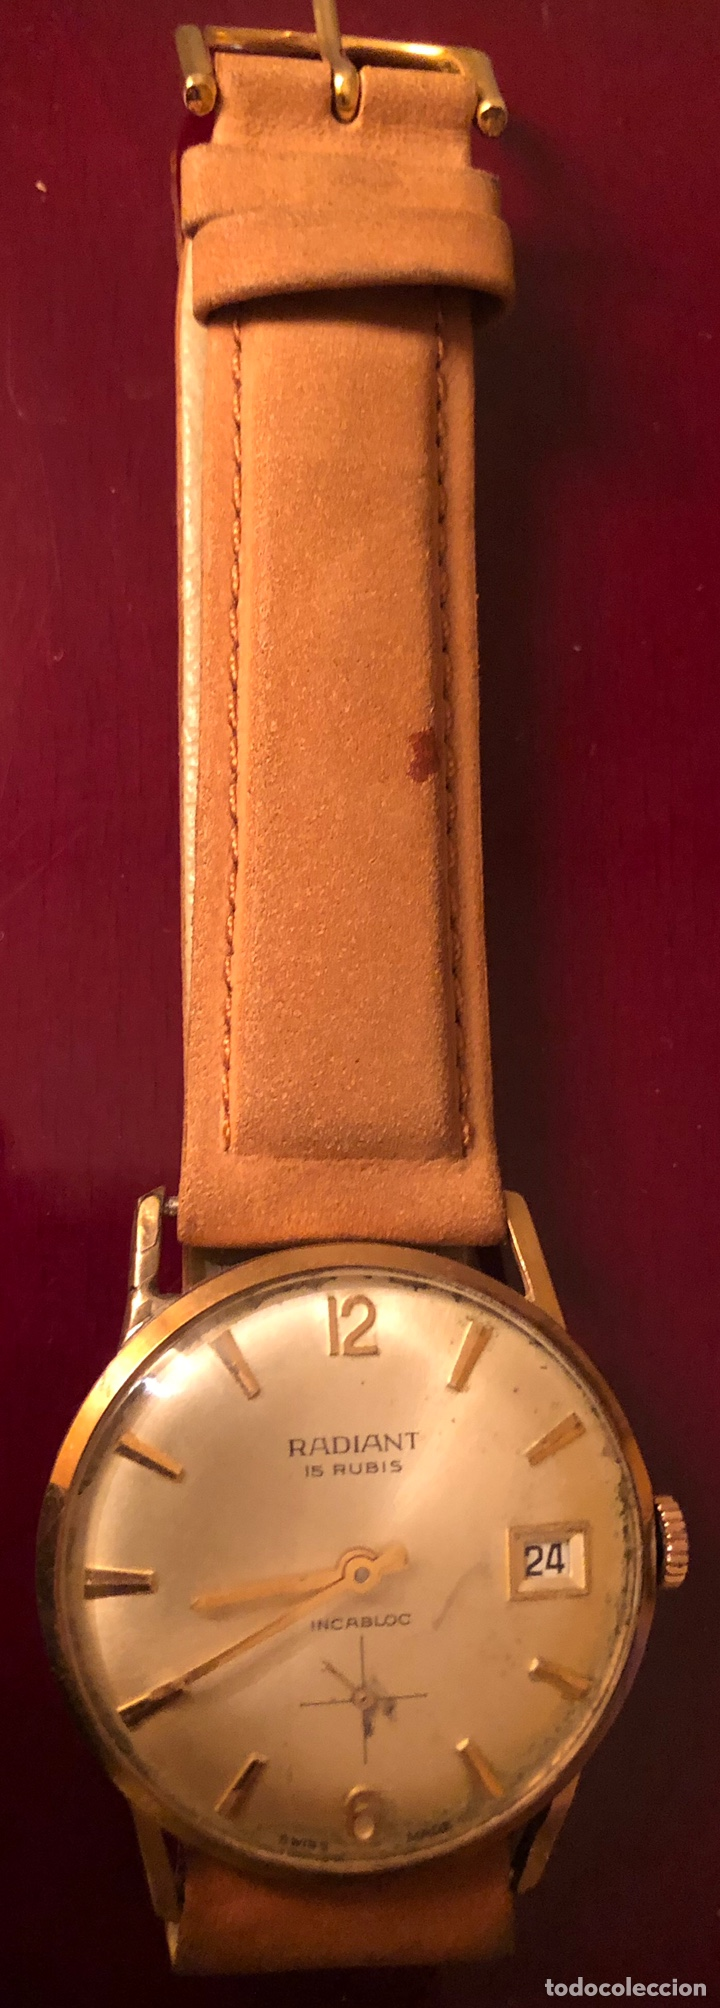 Relojes de pulsera: Reloj de pulsera, de carga manual Radiant - Foto 3 - 165407626